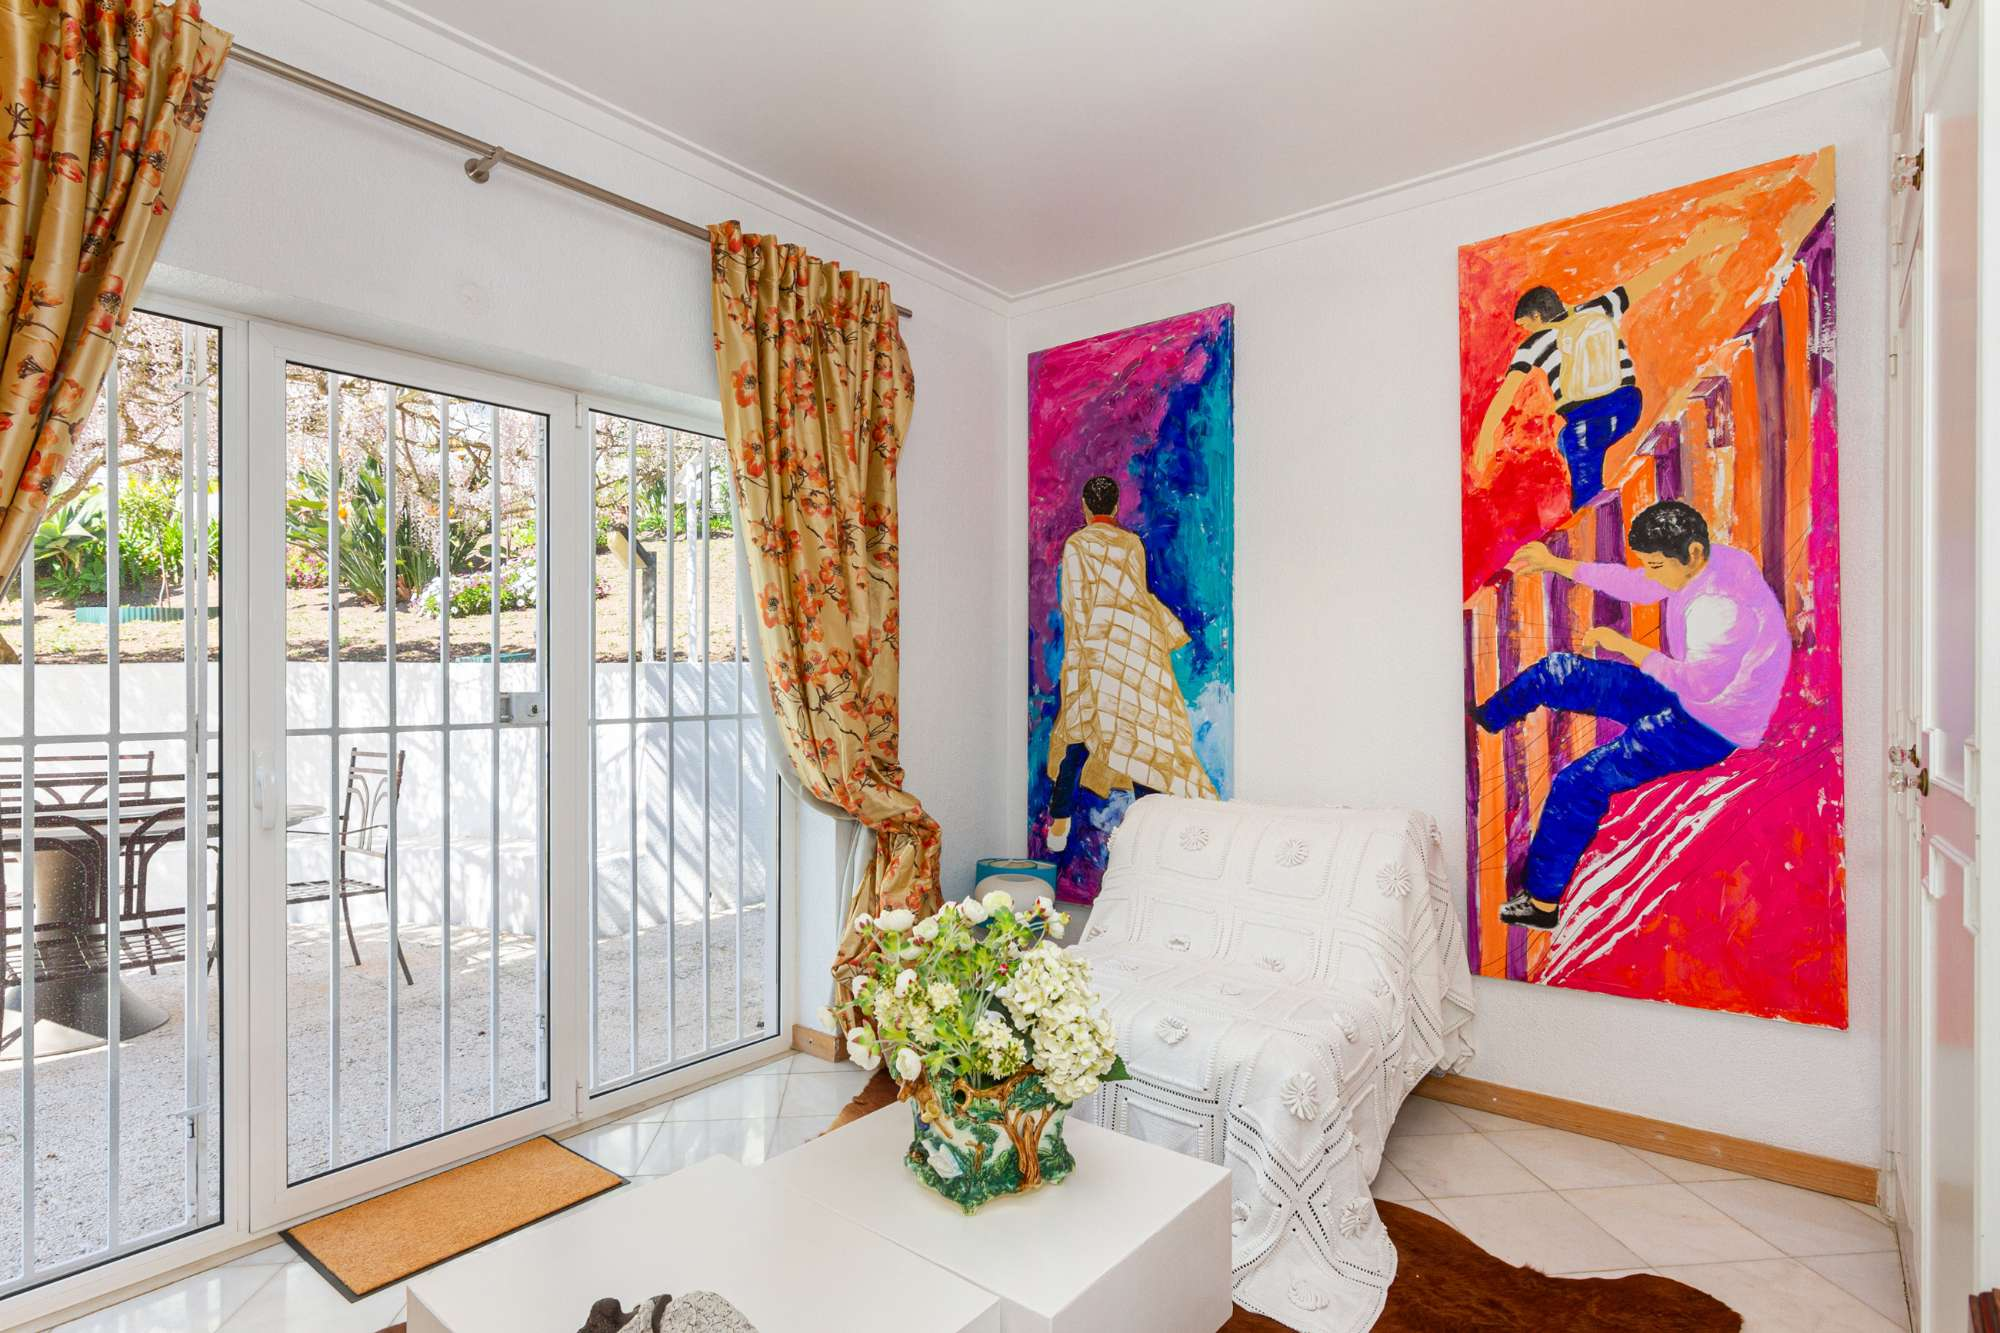 5 Bedroom House, Oeiras